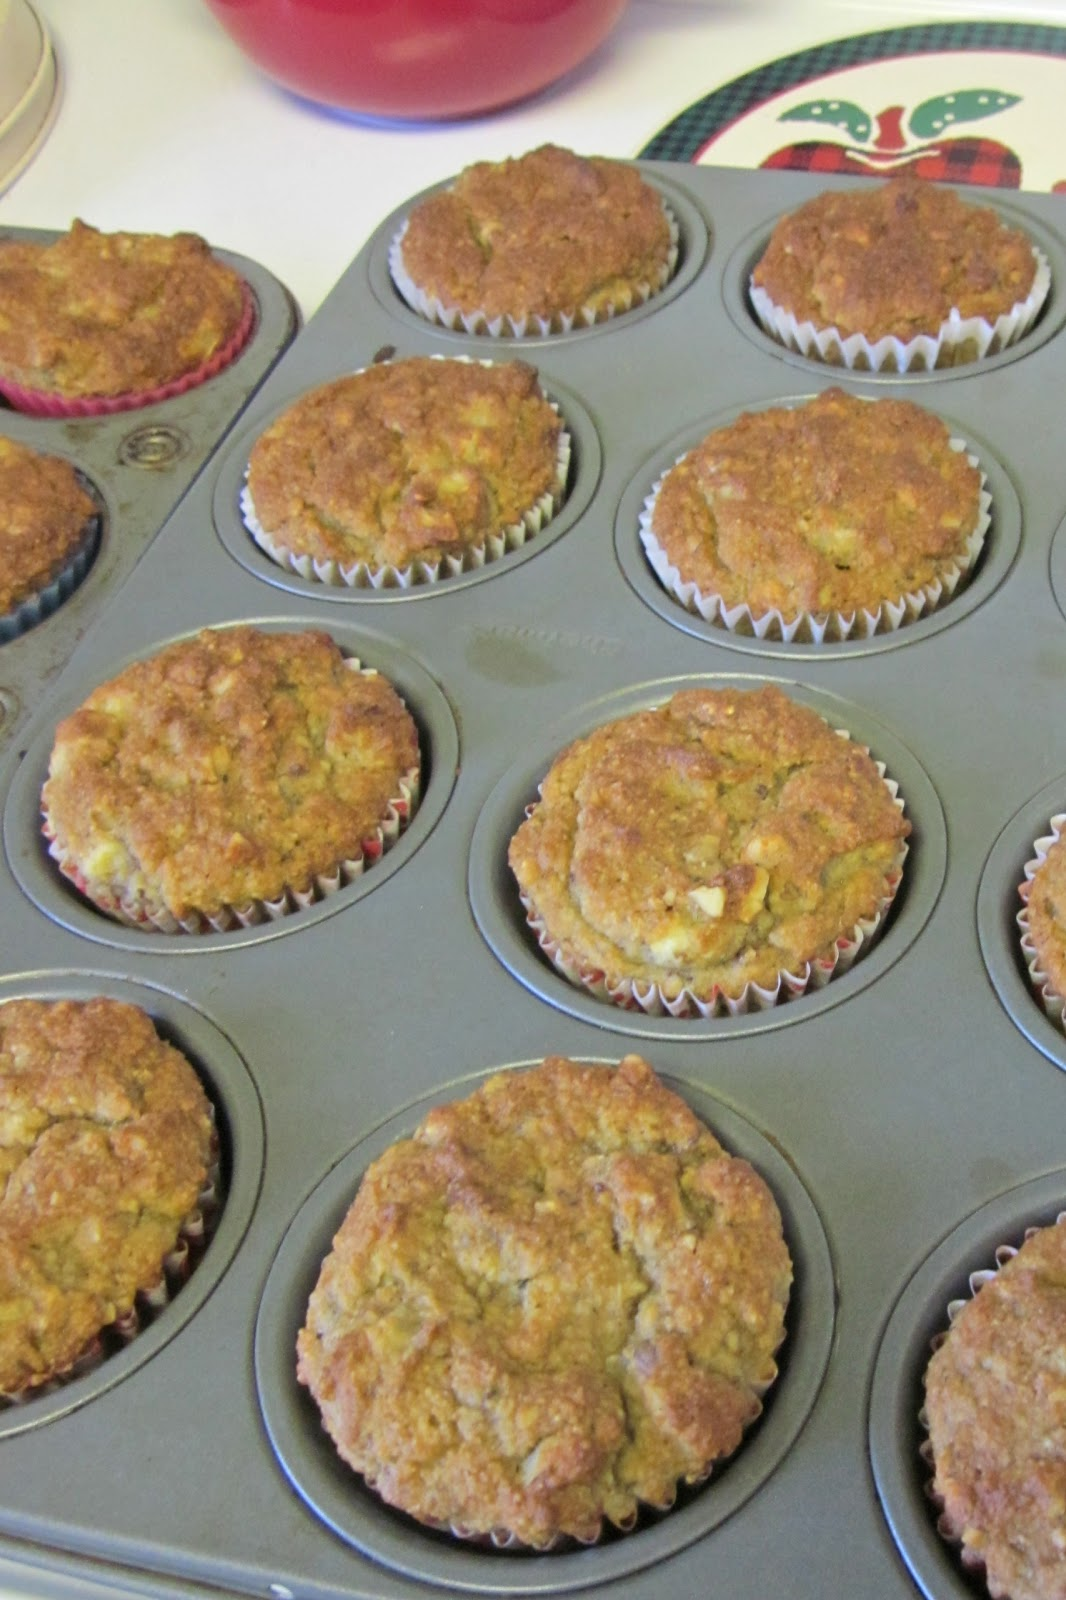 No Grain, No Pain: Banana Nut Muffins - Paleo Style!